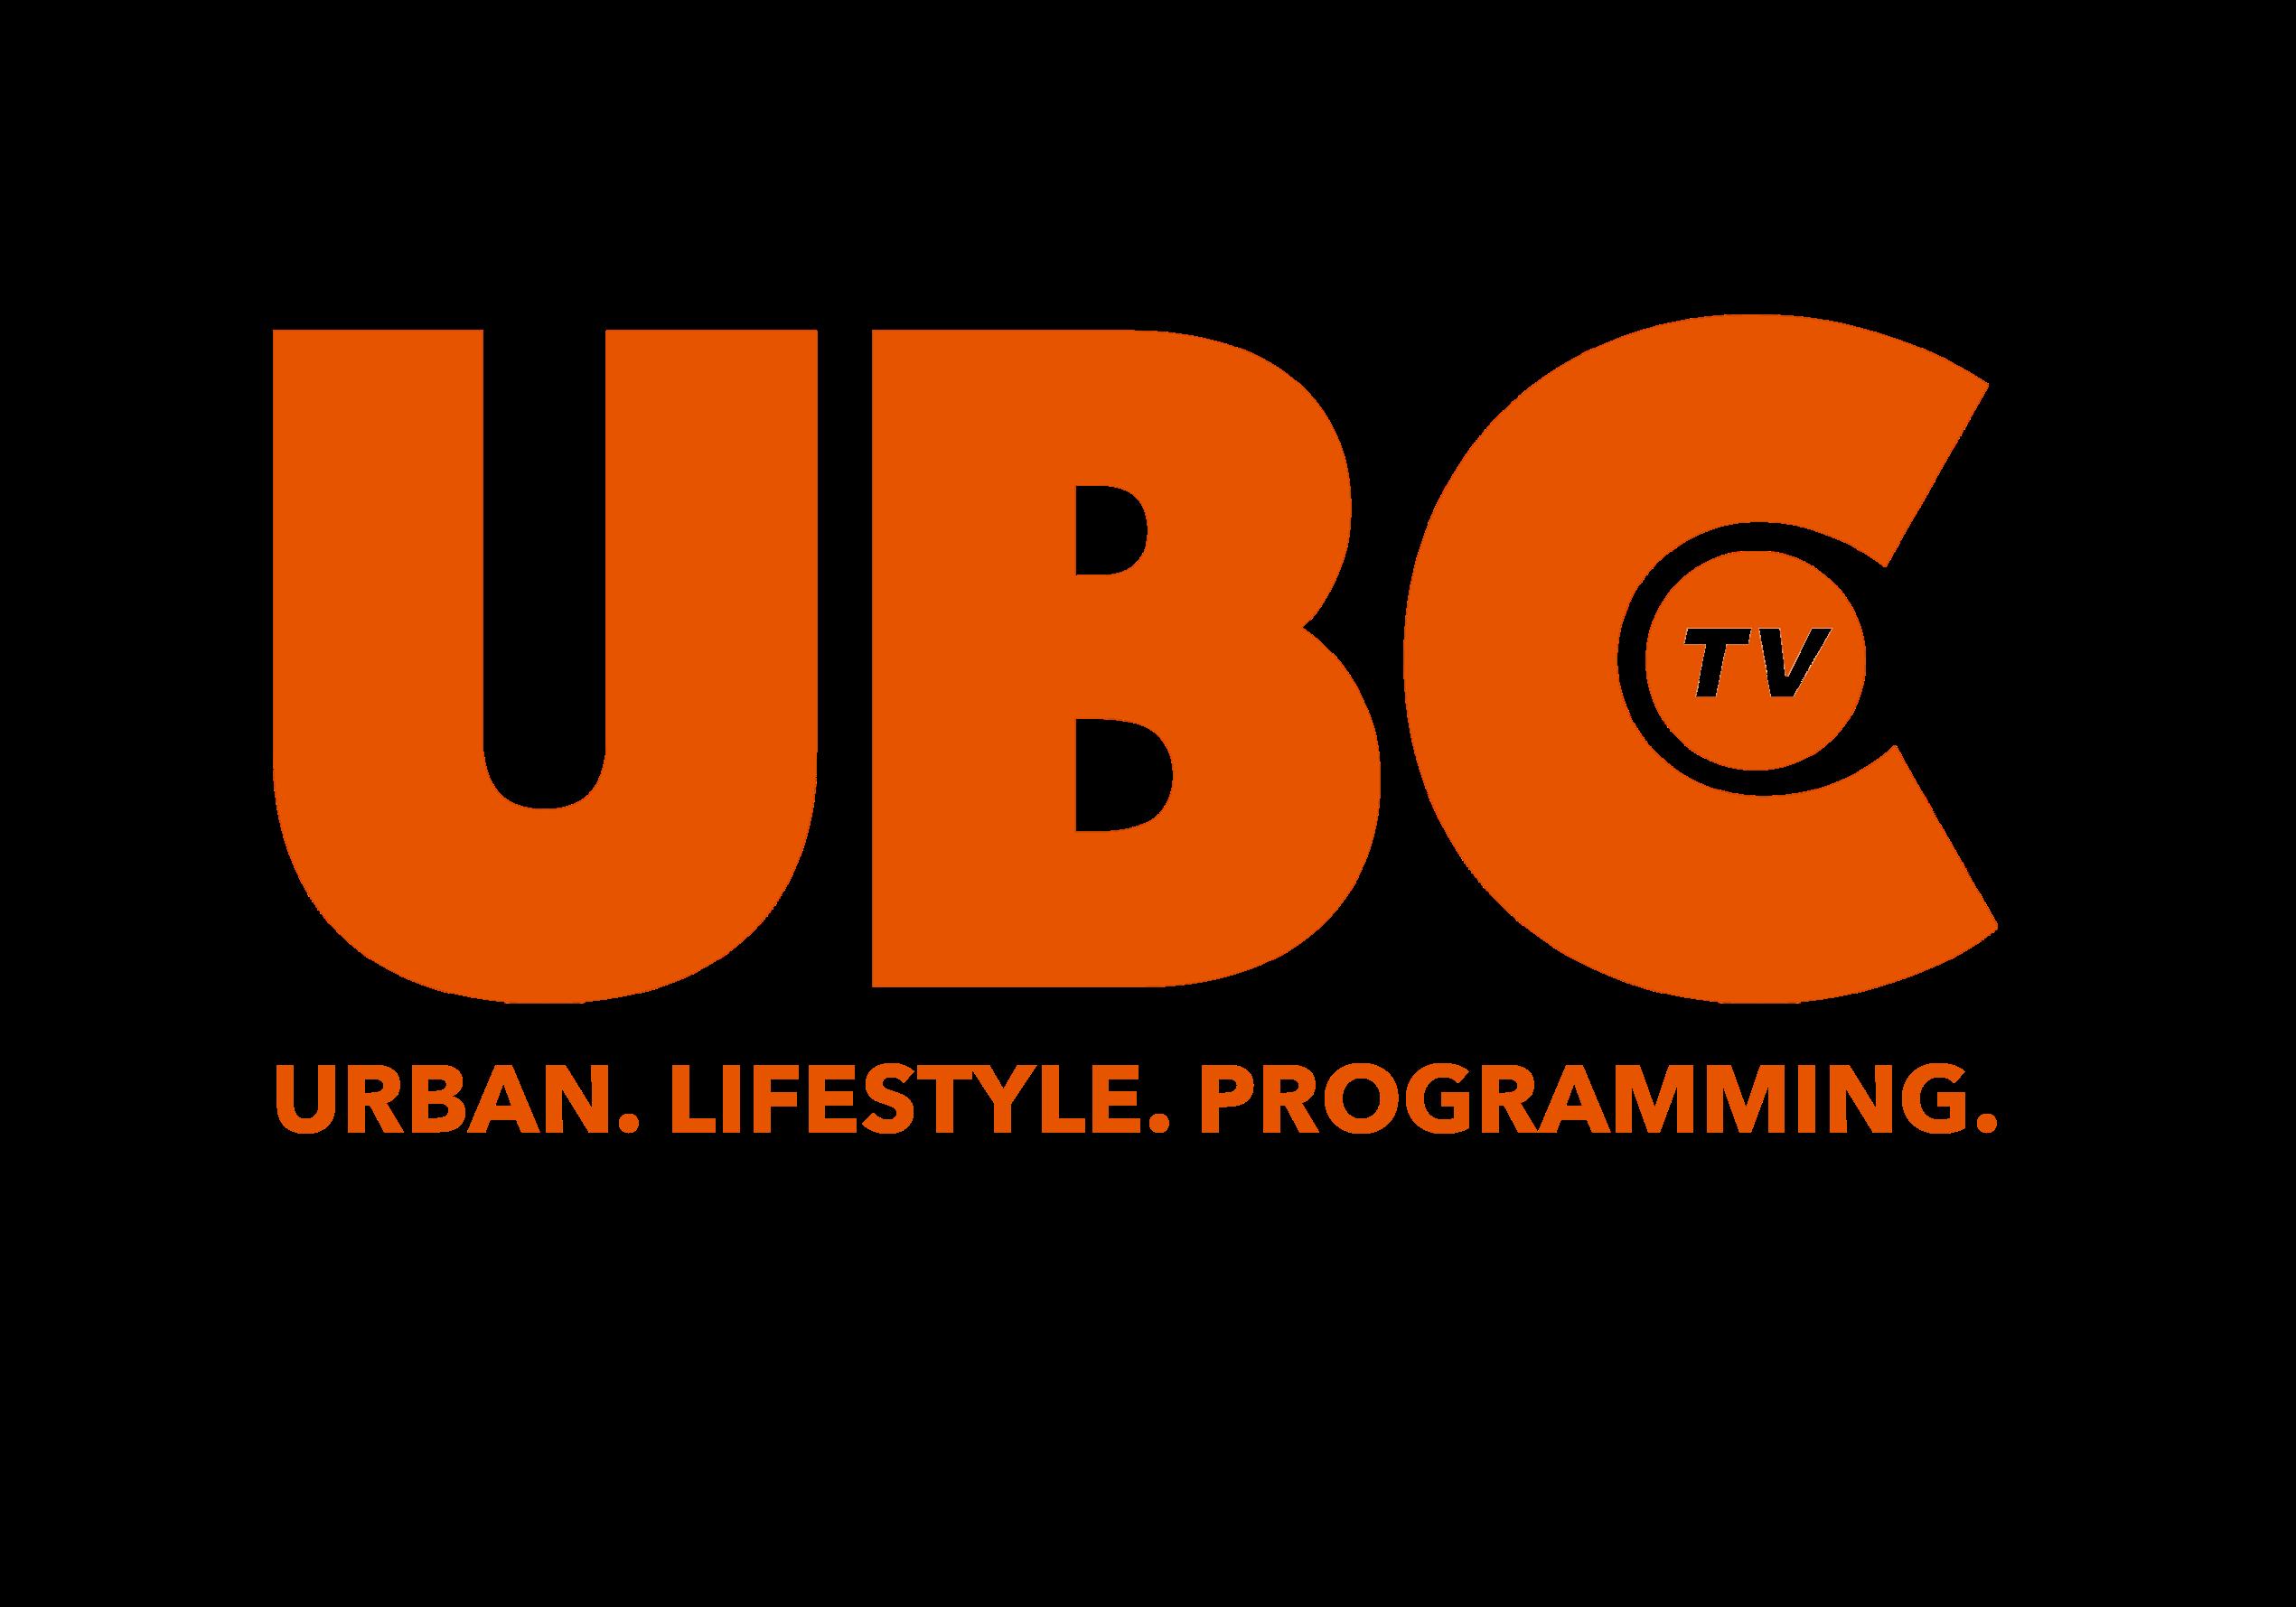 UBCTV